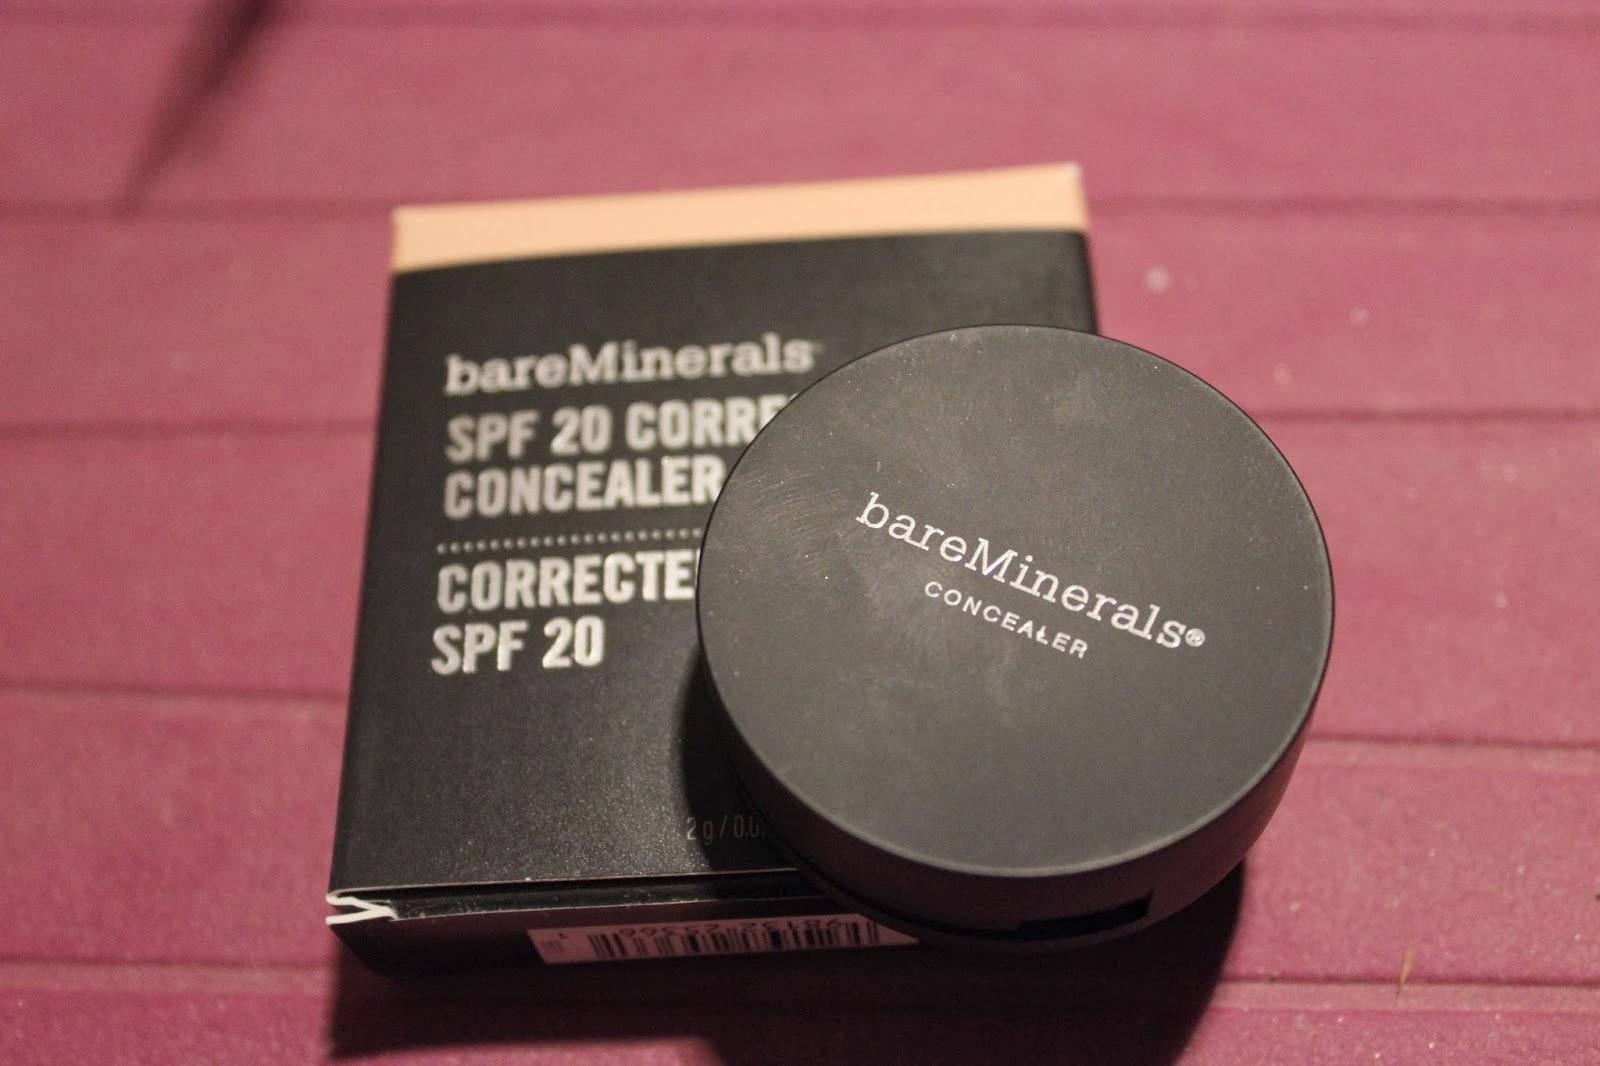 correcteur crème SPF 20 bareMinerals concealer